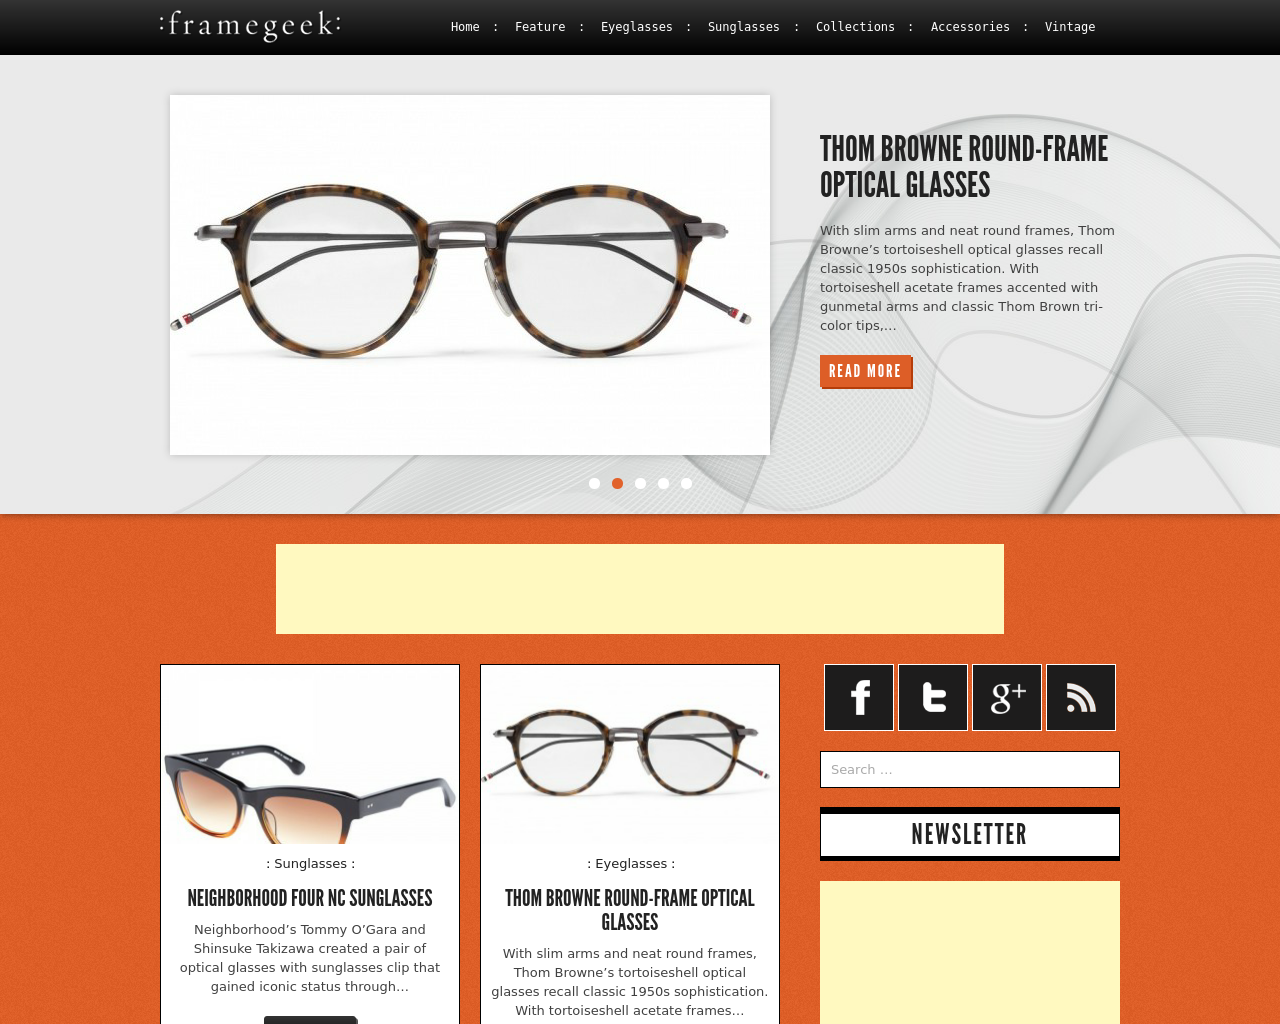 Frame-Geek-Advertising-Reviews-Pricing